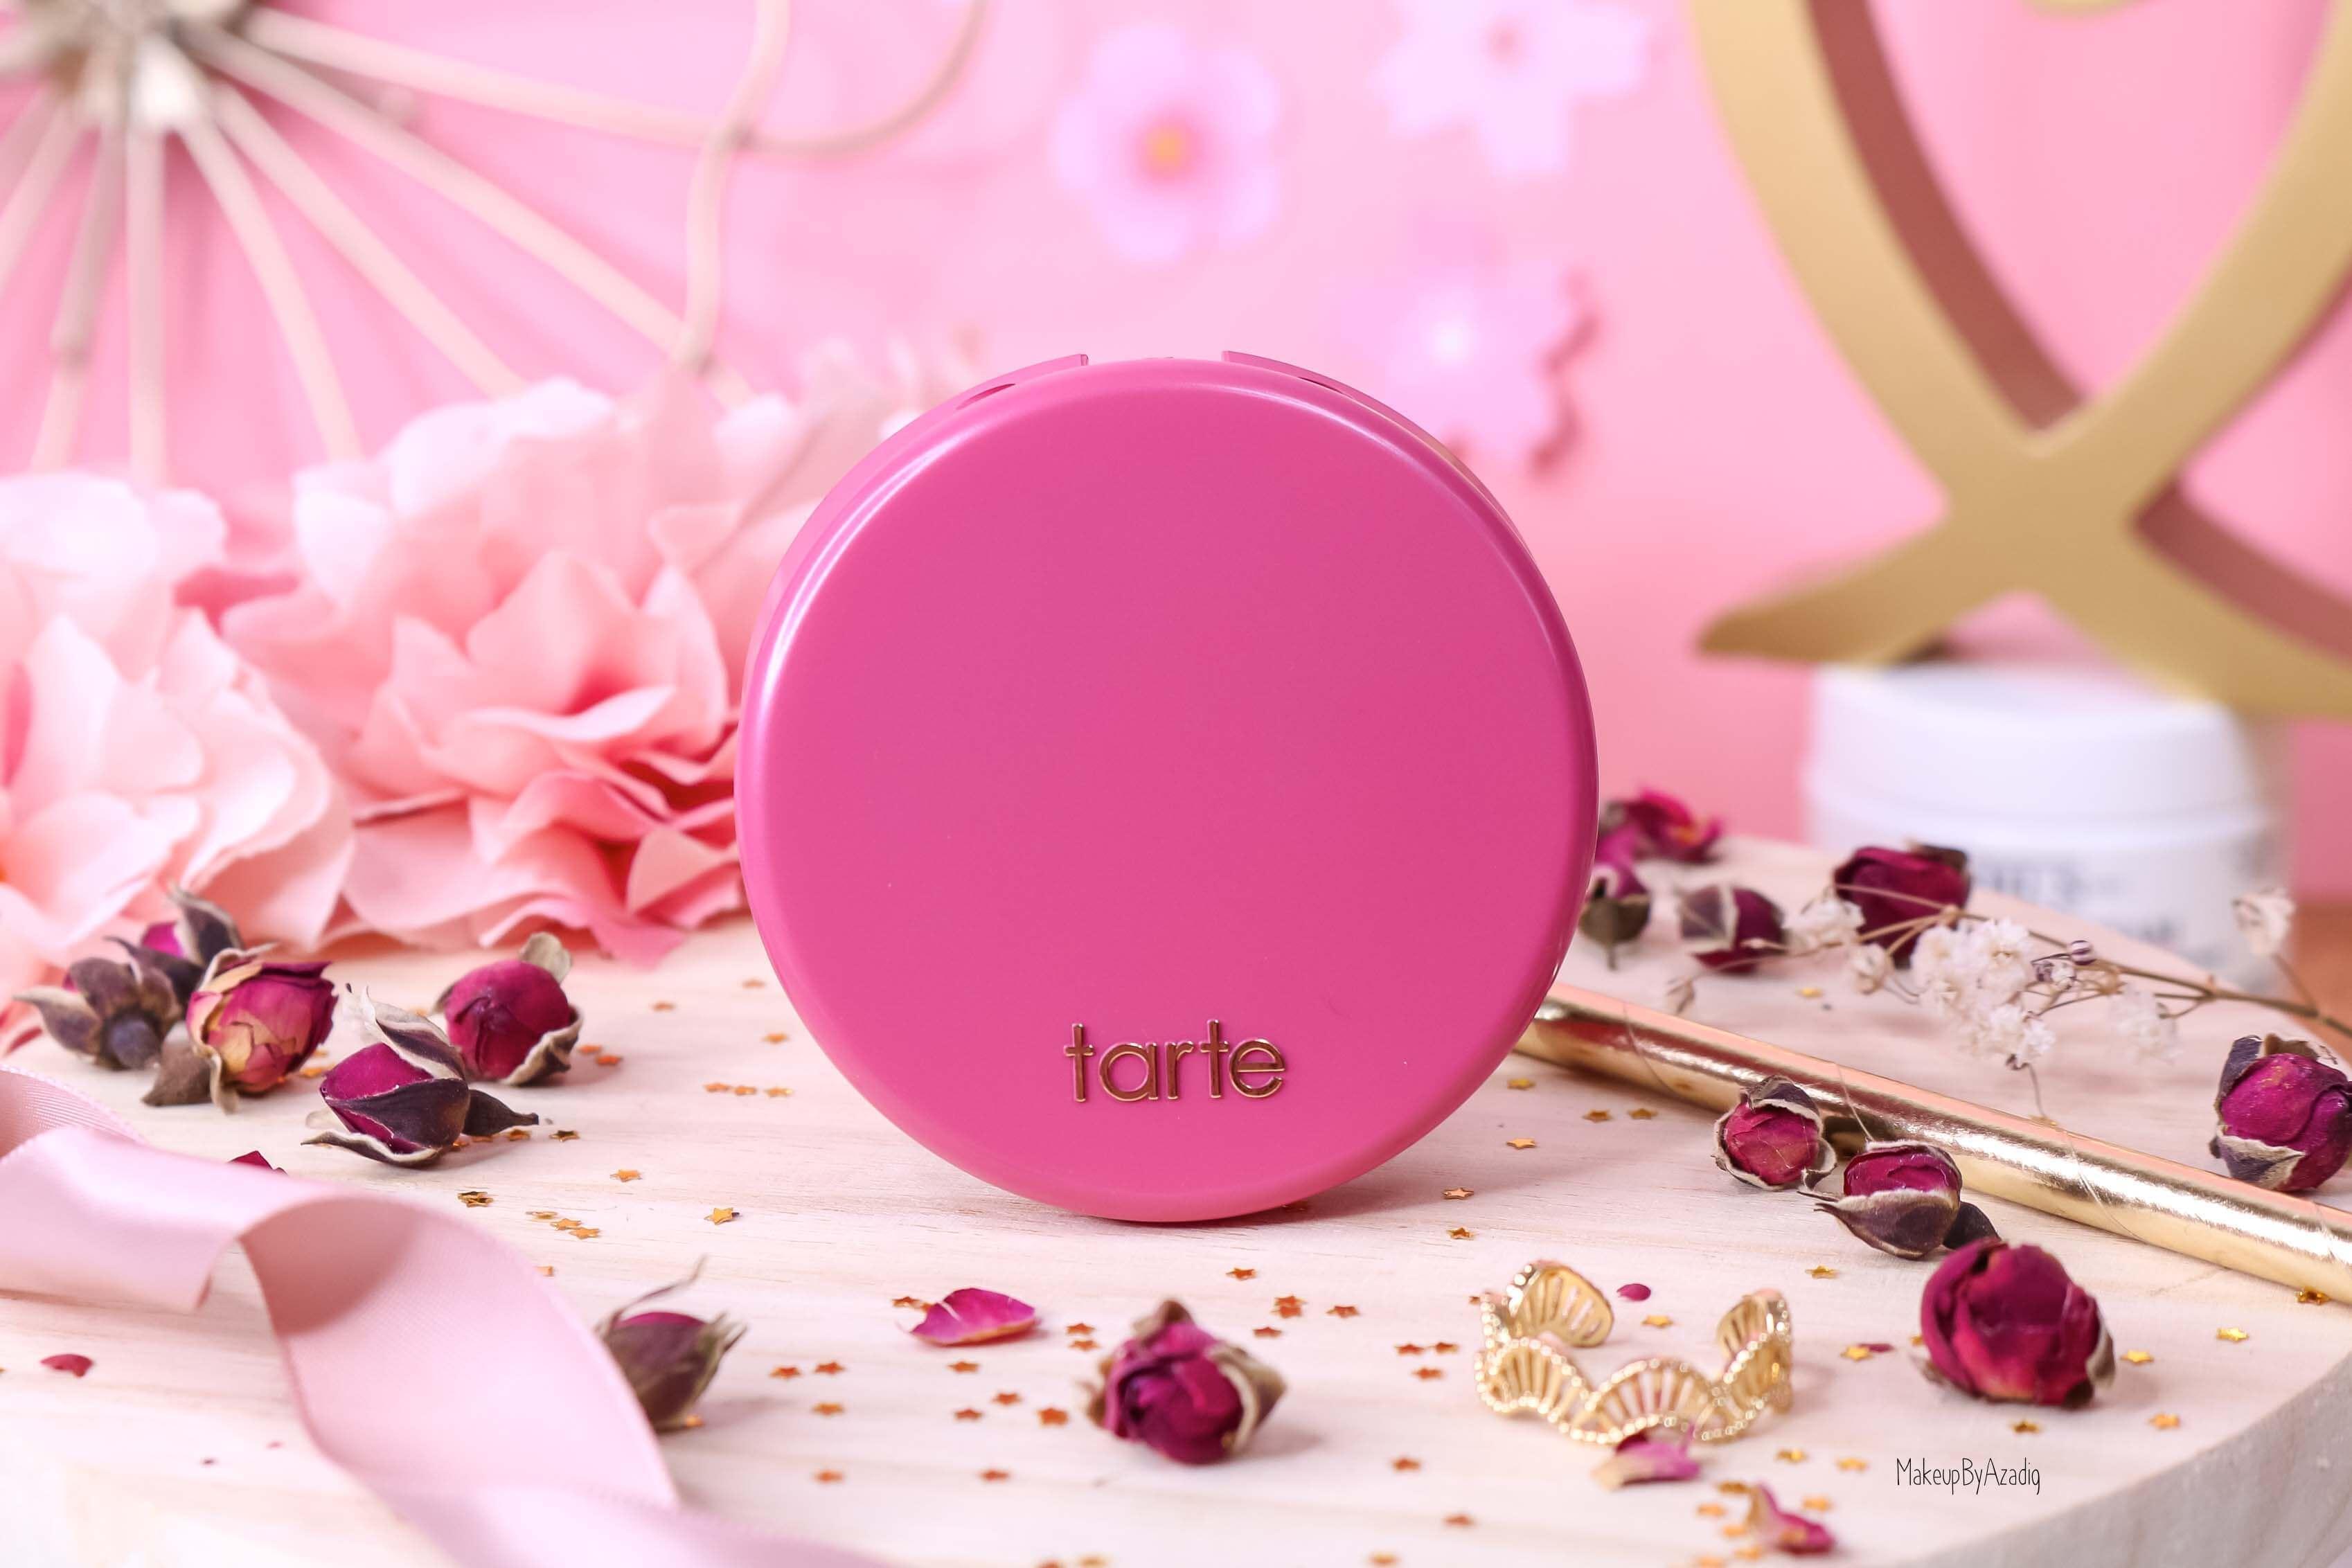 revue-blush-amazonian-clay-tarte-cosmetics-makeupbyazadig-sephora-france-blushing-bride-swatch-avis-prix-packaging